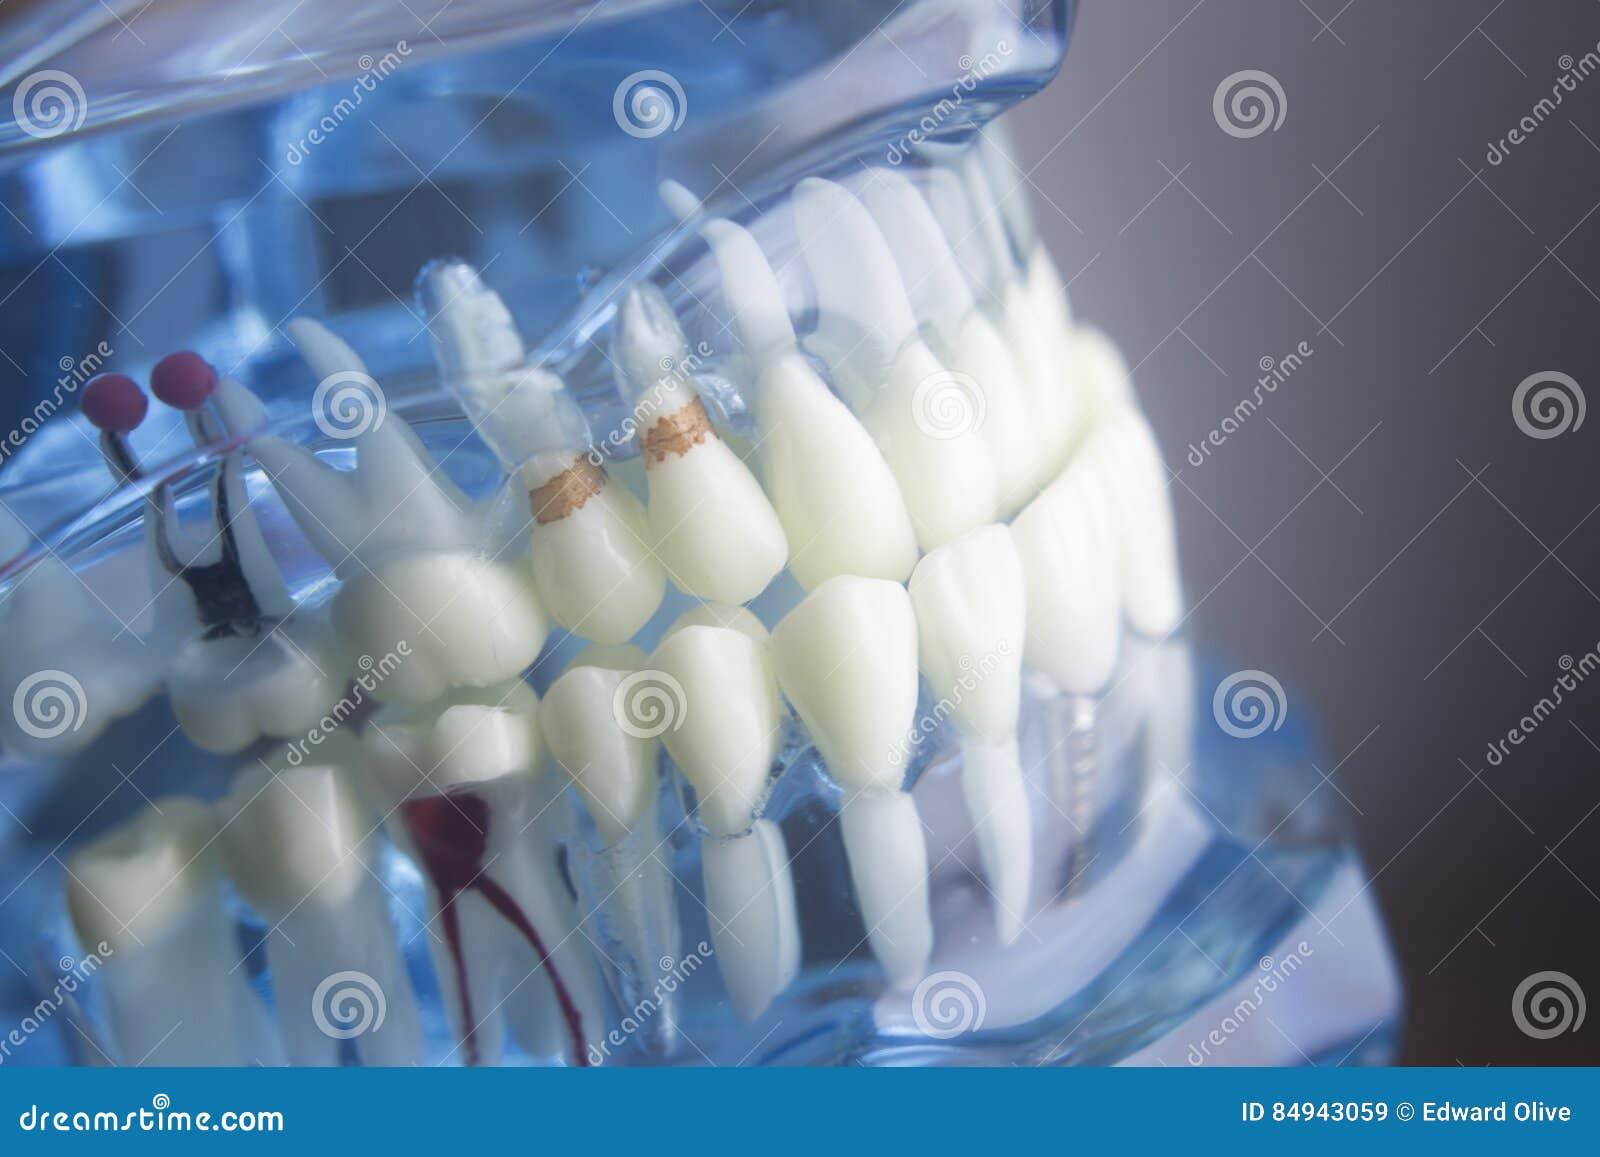 Dental teeth dentistry model